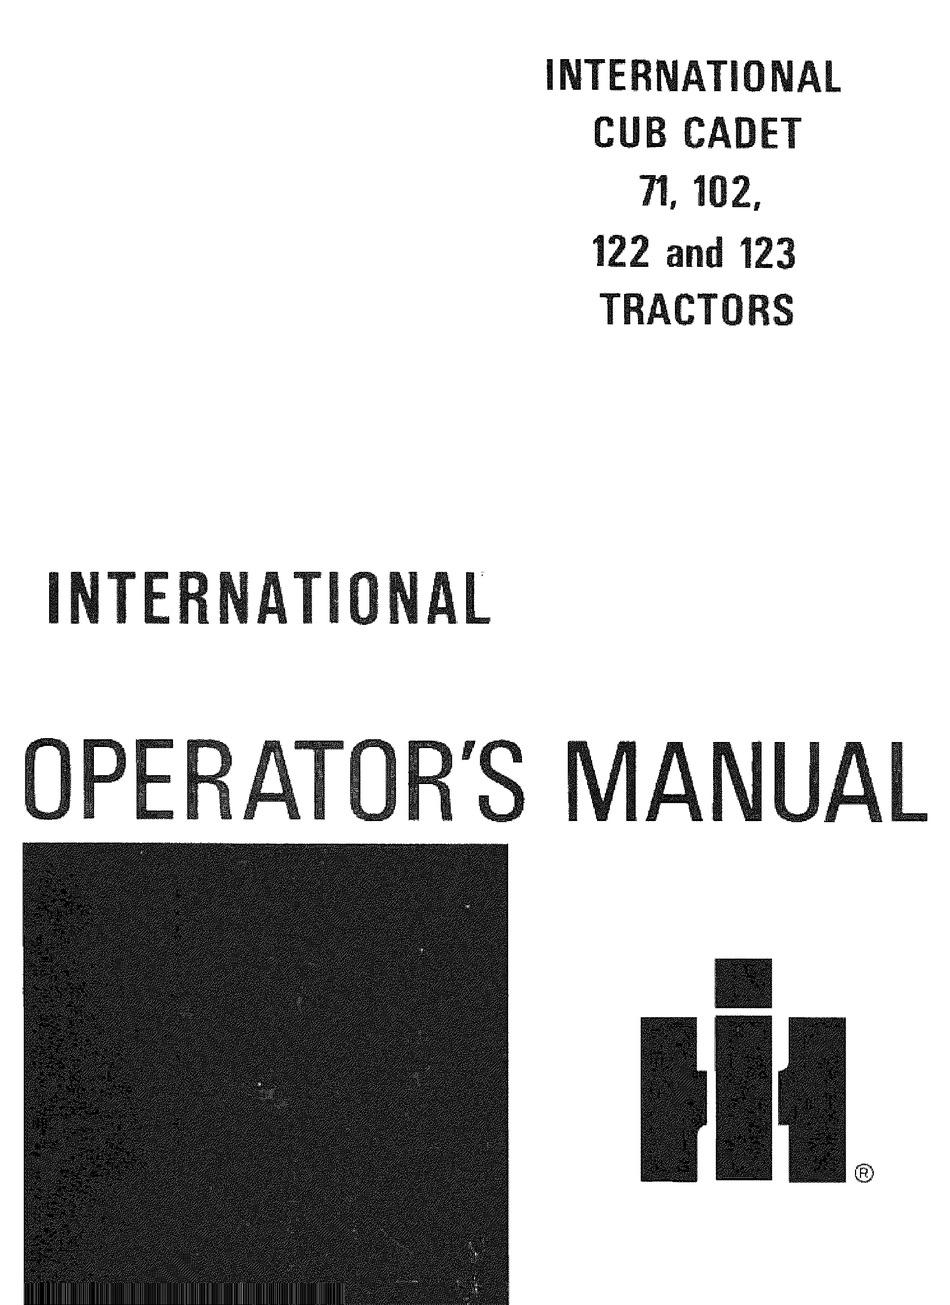 INTERNATIONAL HARVESTER COMPANY 102 OPERATOR'S MANUAL Pdf